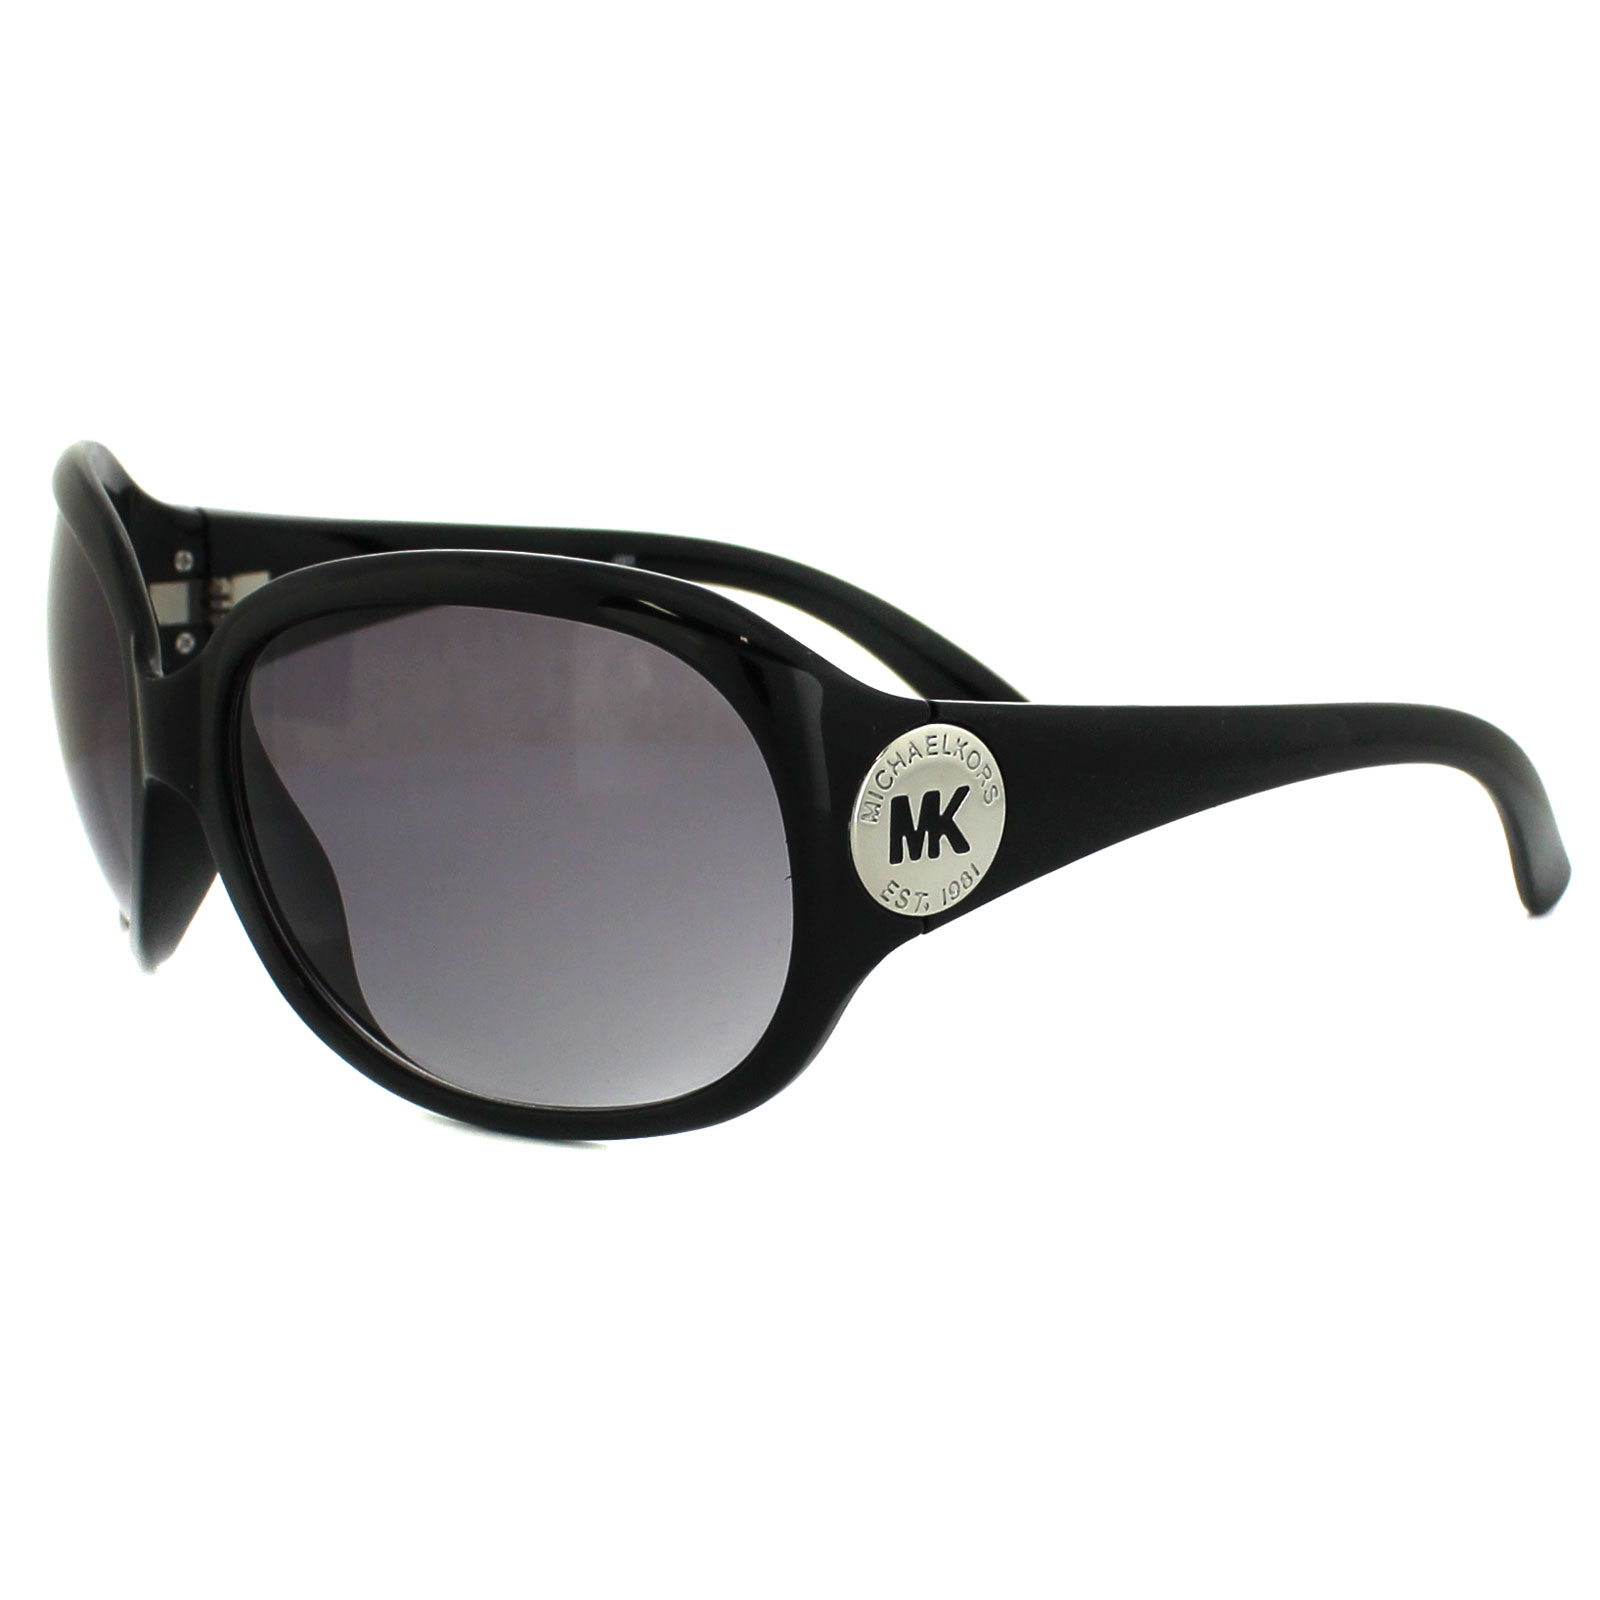 6ef62059511 Michael Kors Sunglasses M3609S 001 Black Grey Gradient 883121274501 ...